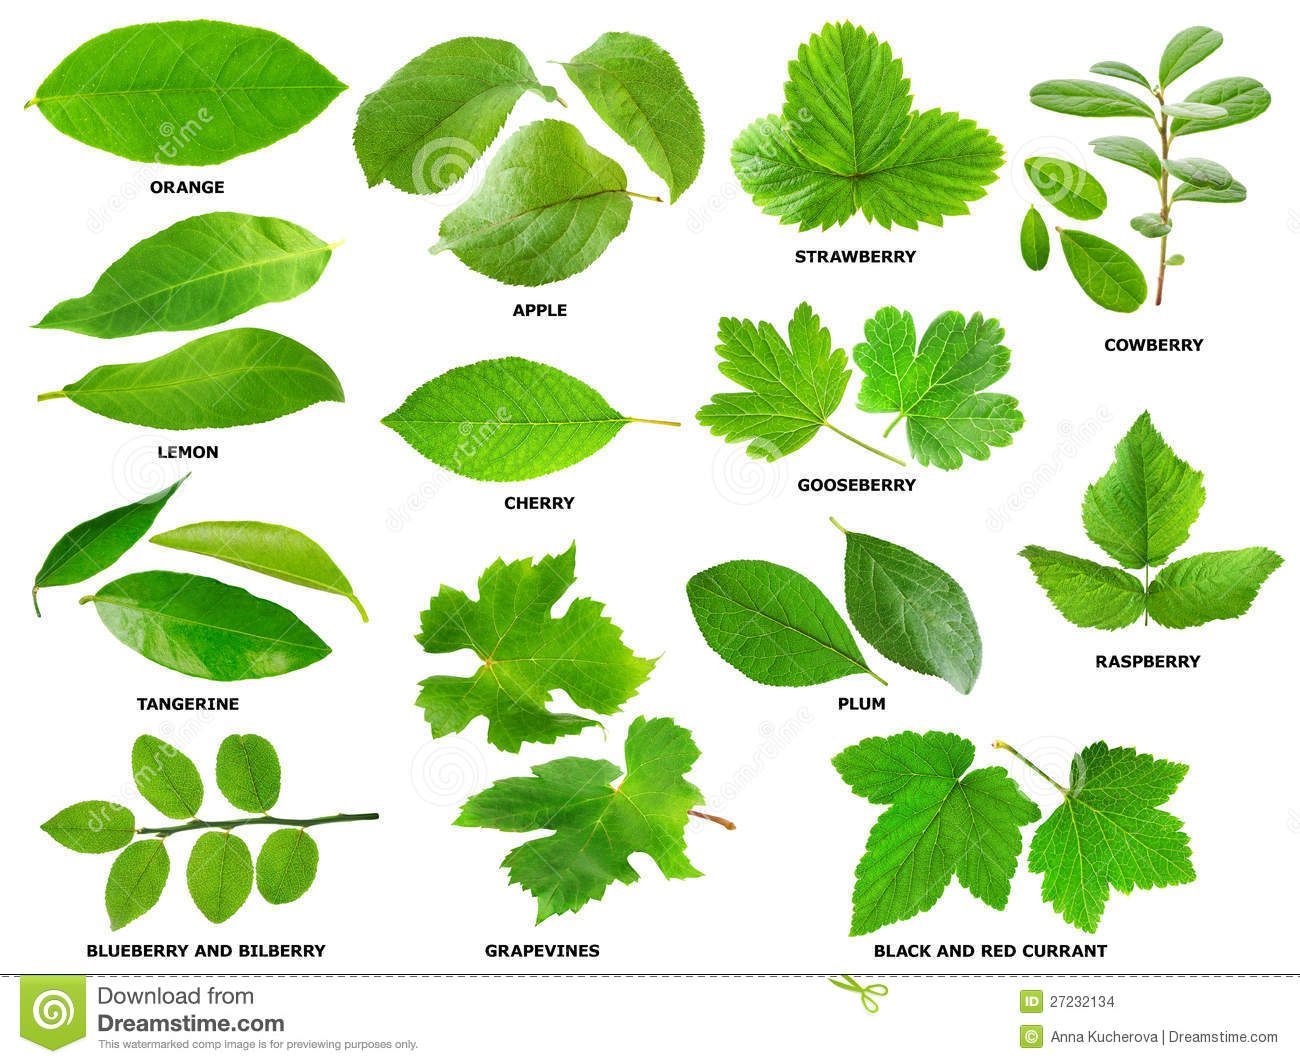 Leaves Of Fruit Berry Shrubs And Trees Leaves Shrubs Plant Leaves